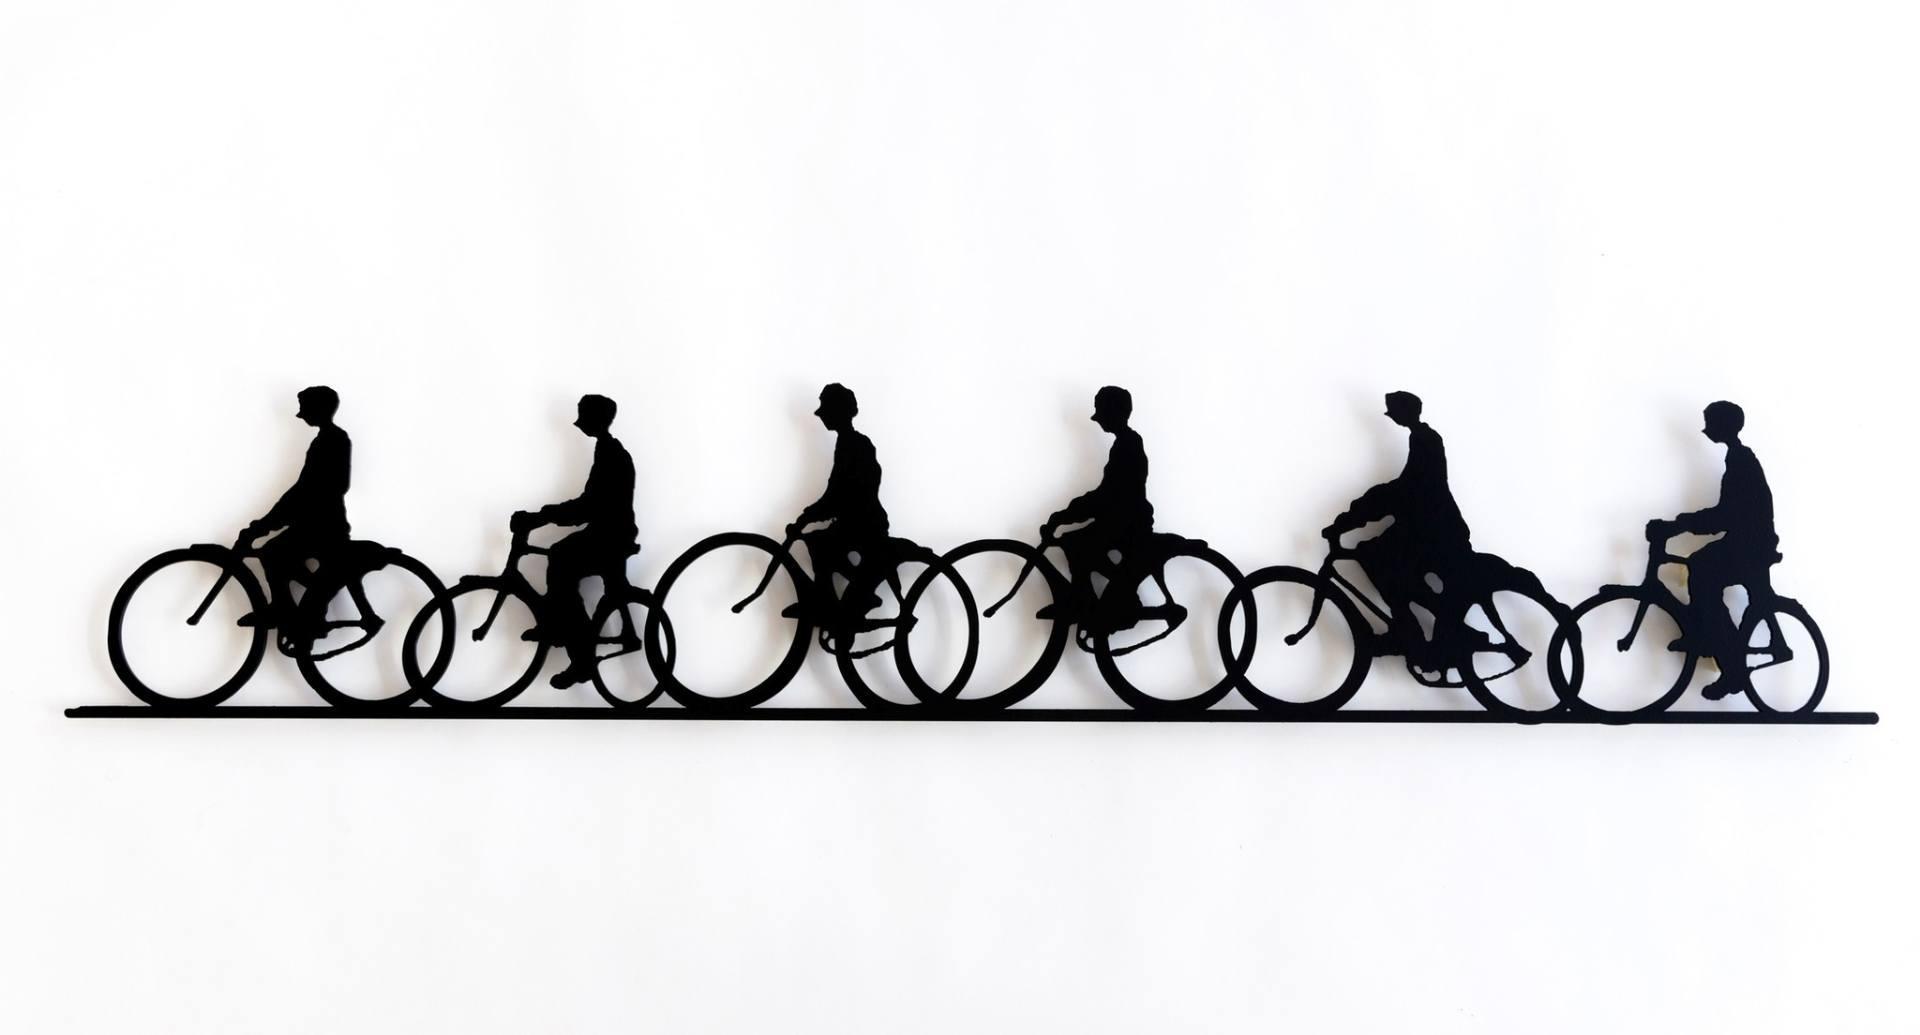 Saatchi Art: Six Bicycle Riders Sculptureuri Dushy Regarding Metal Bicycle Art (Image 17 of 20)